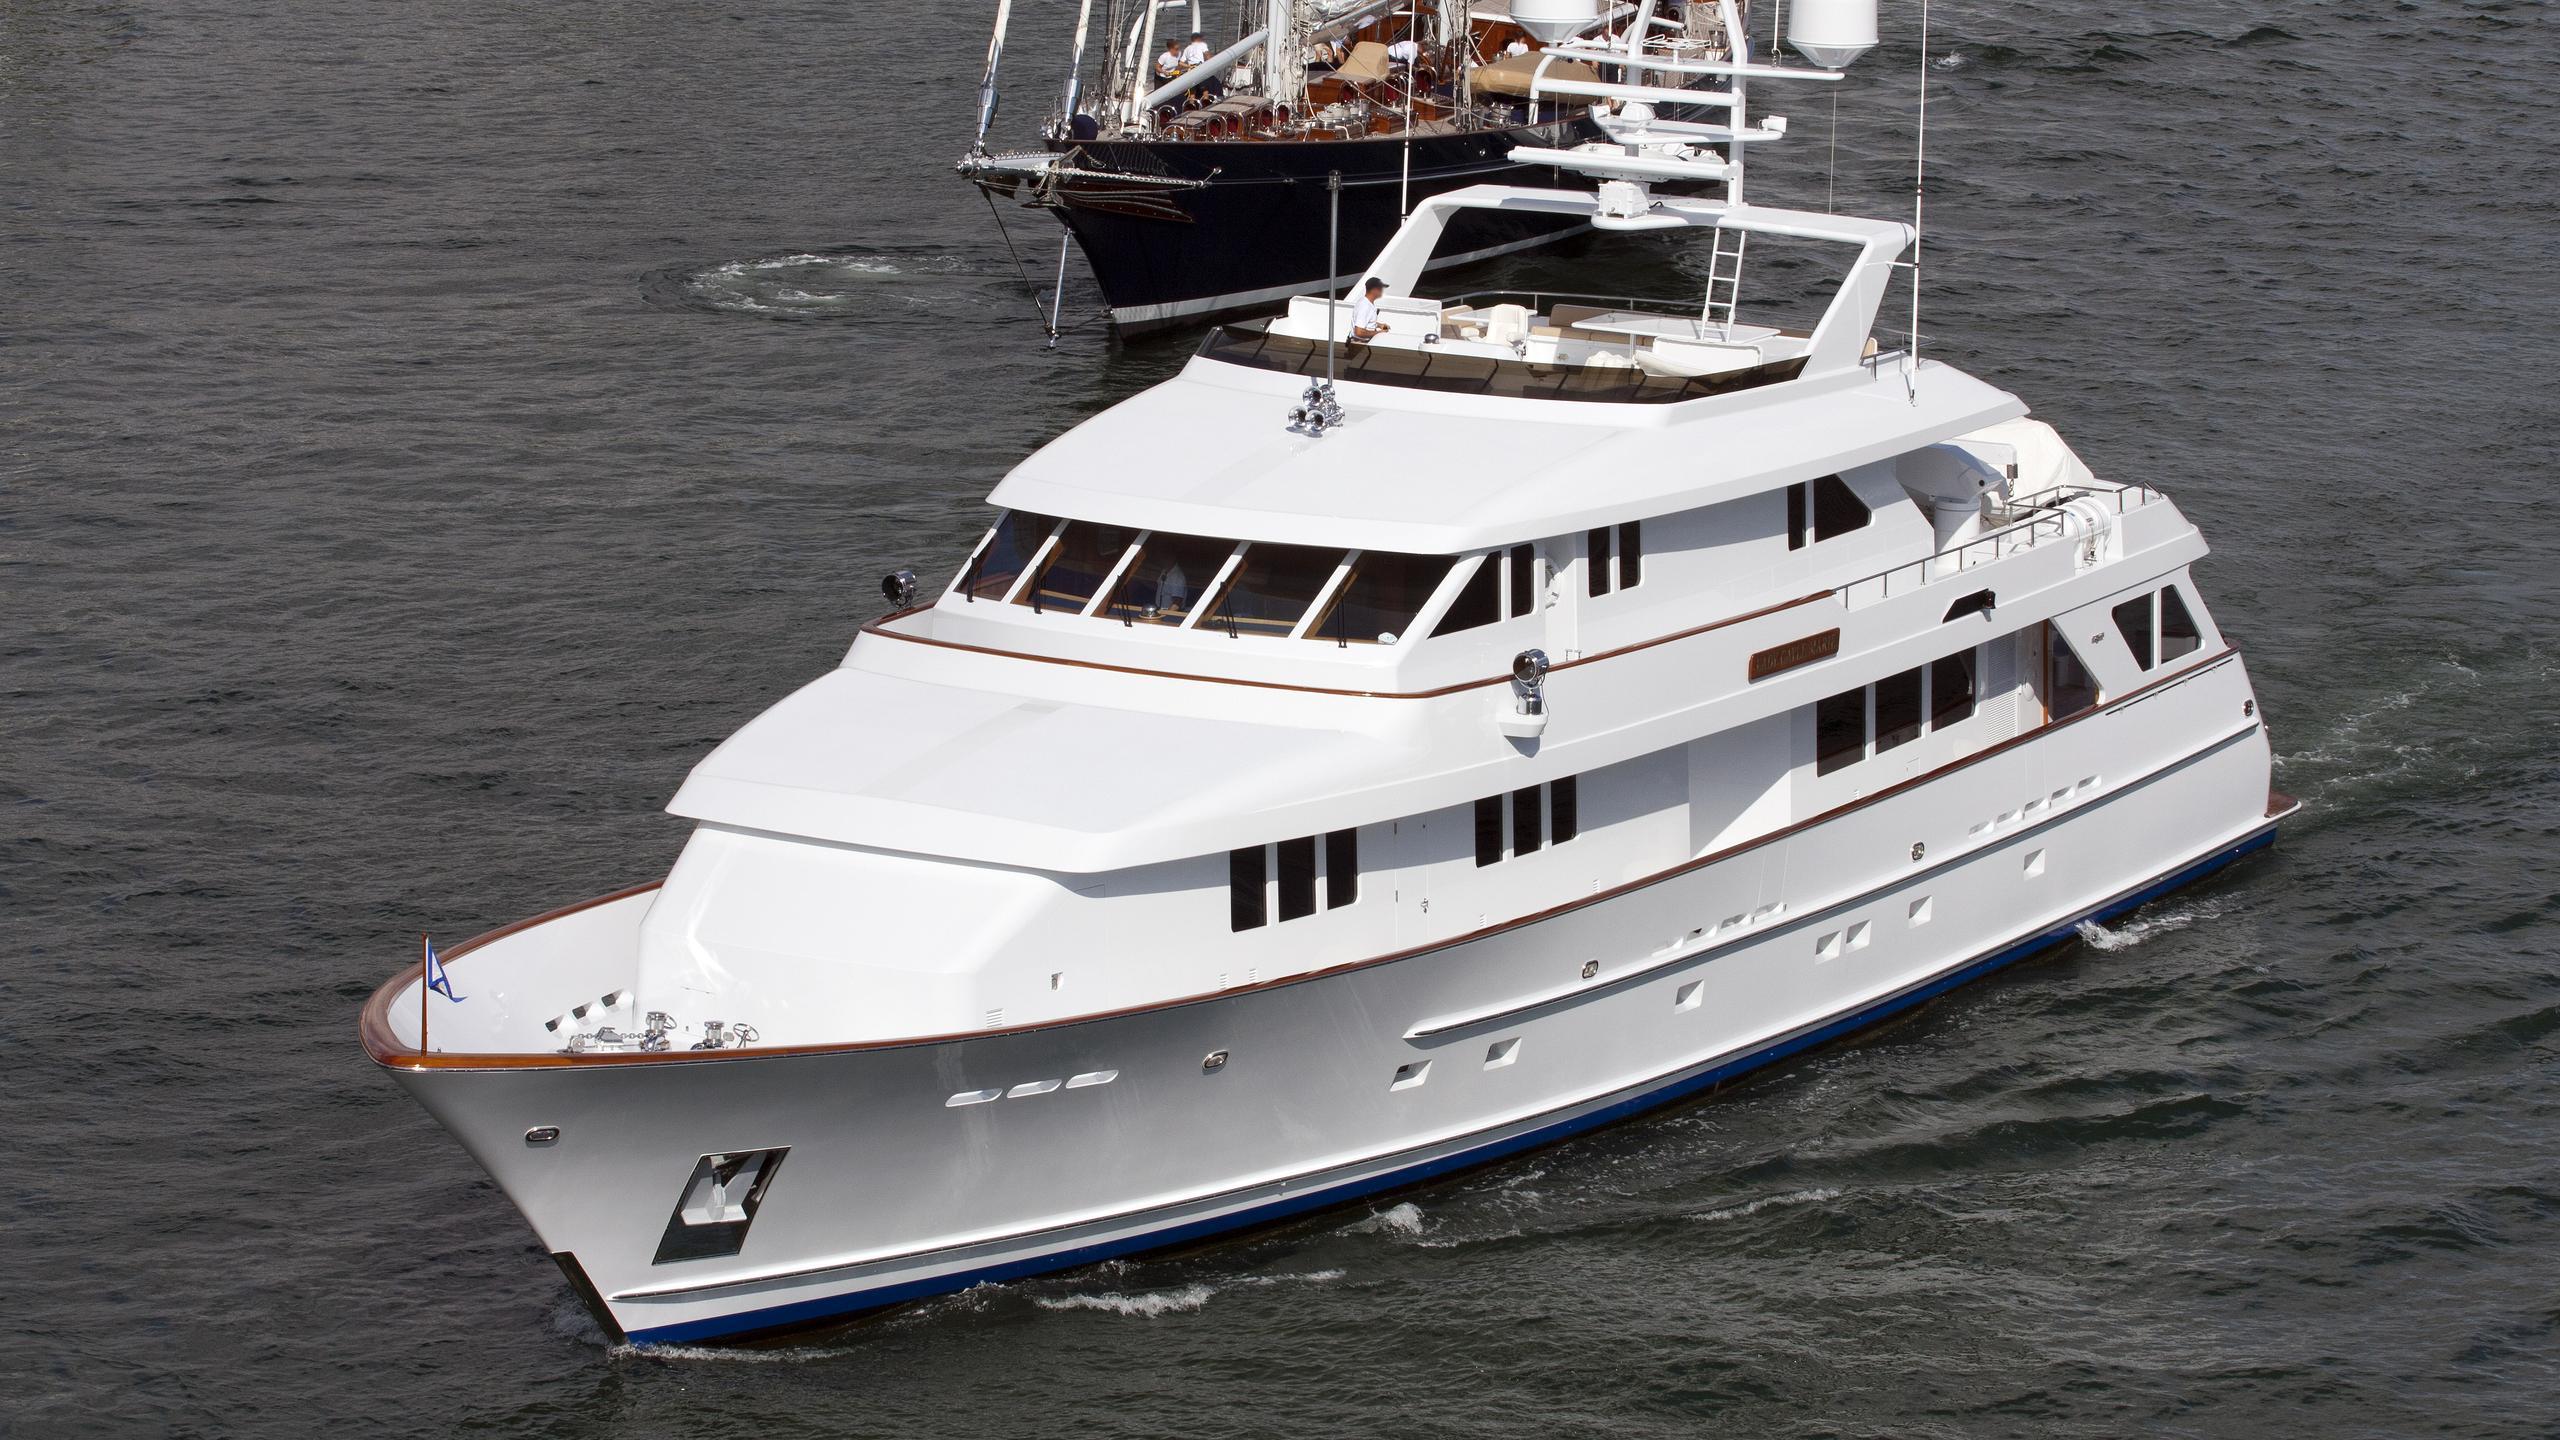 ar-de-motor-yacht-burger-boat-2002-37m-cruising